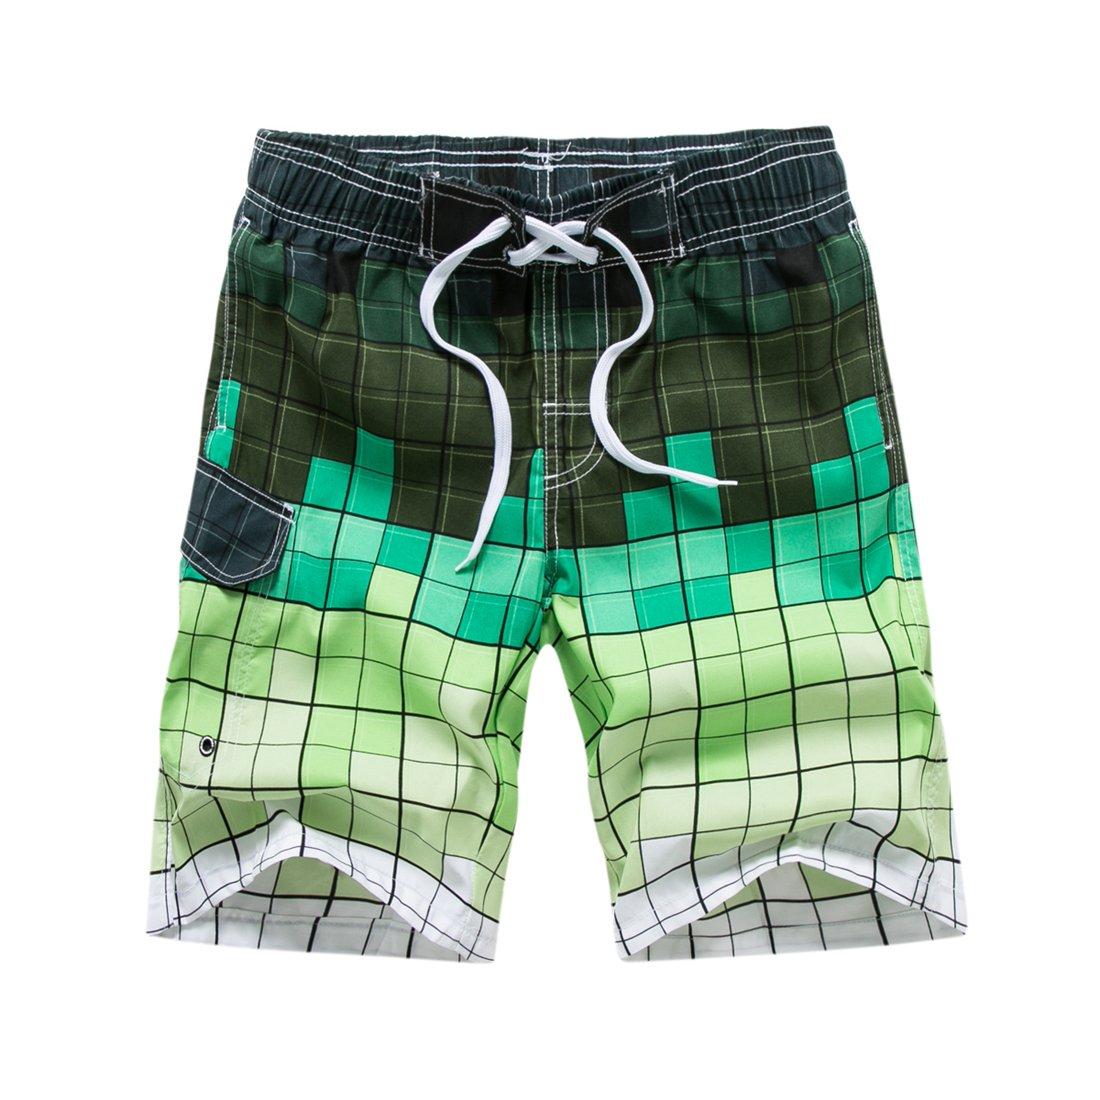 2f842a743a Abangoo Men's Swim Trunks Quick Dry Beach Shorts Swimming Watershort  Elastic Waist Shorts